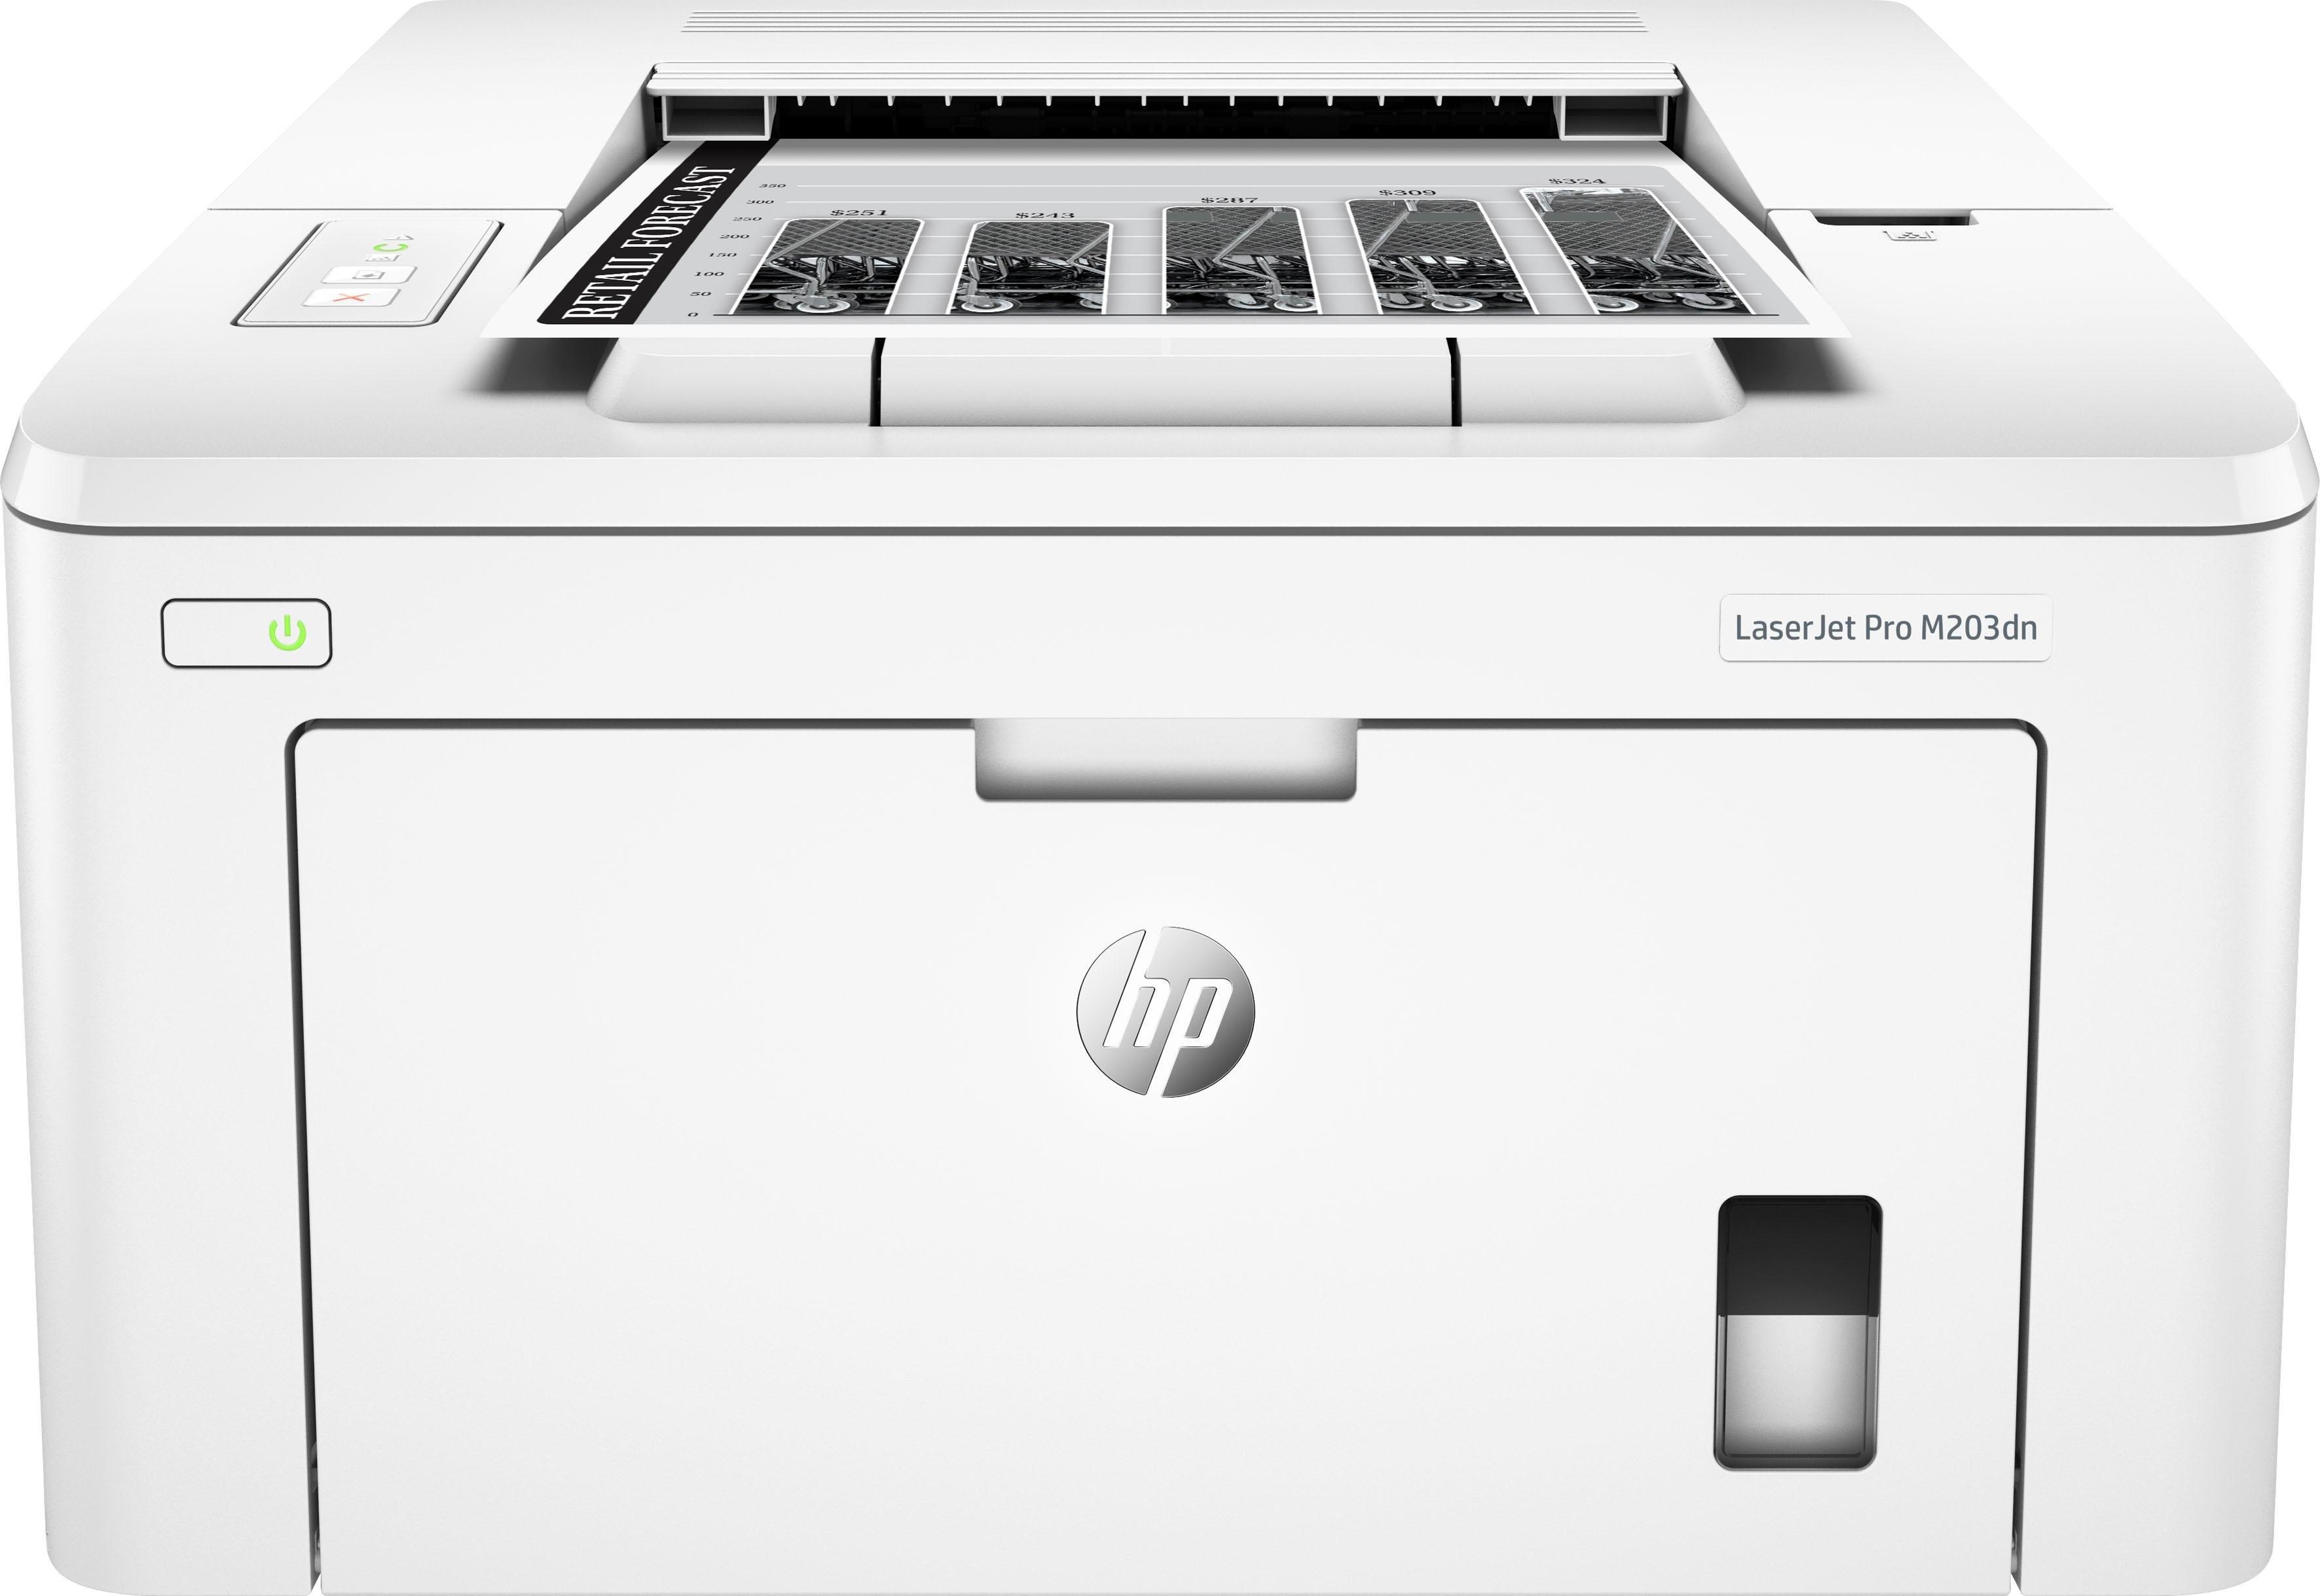 HP LaserJet Pro M203dn printer nu online bestellen